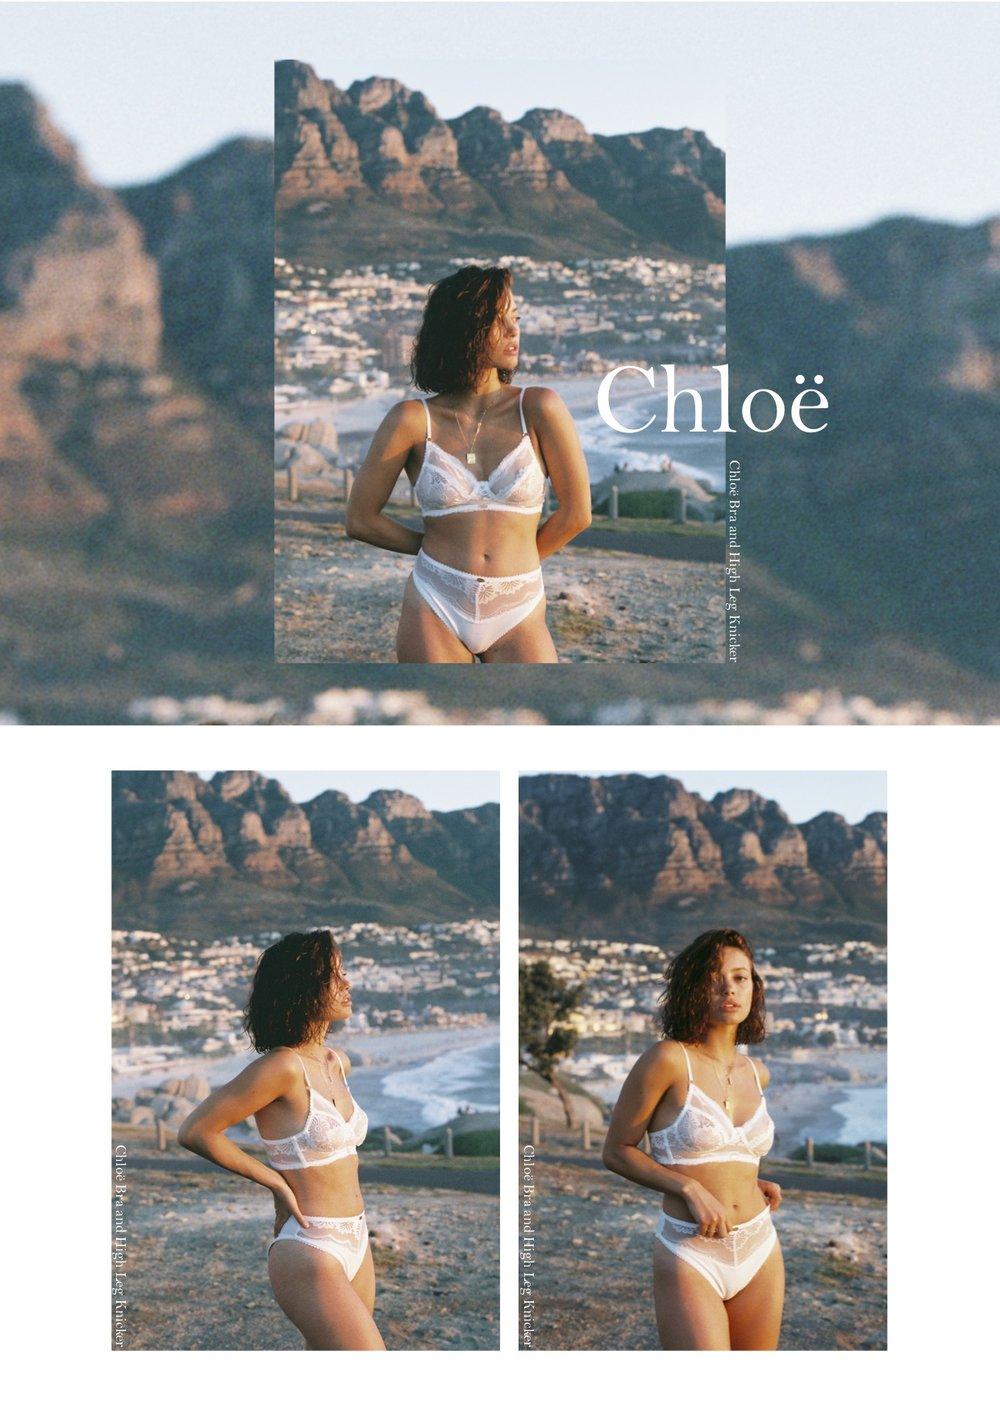 Chloe 1 .jpg